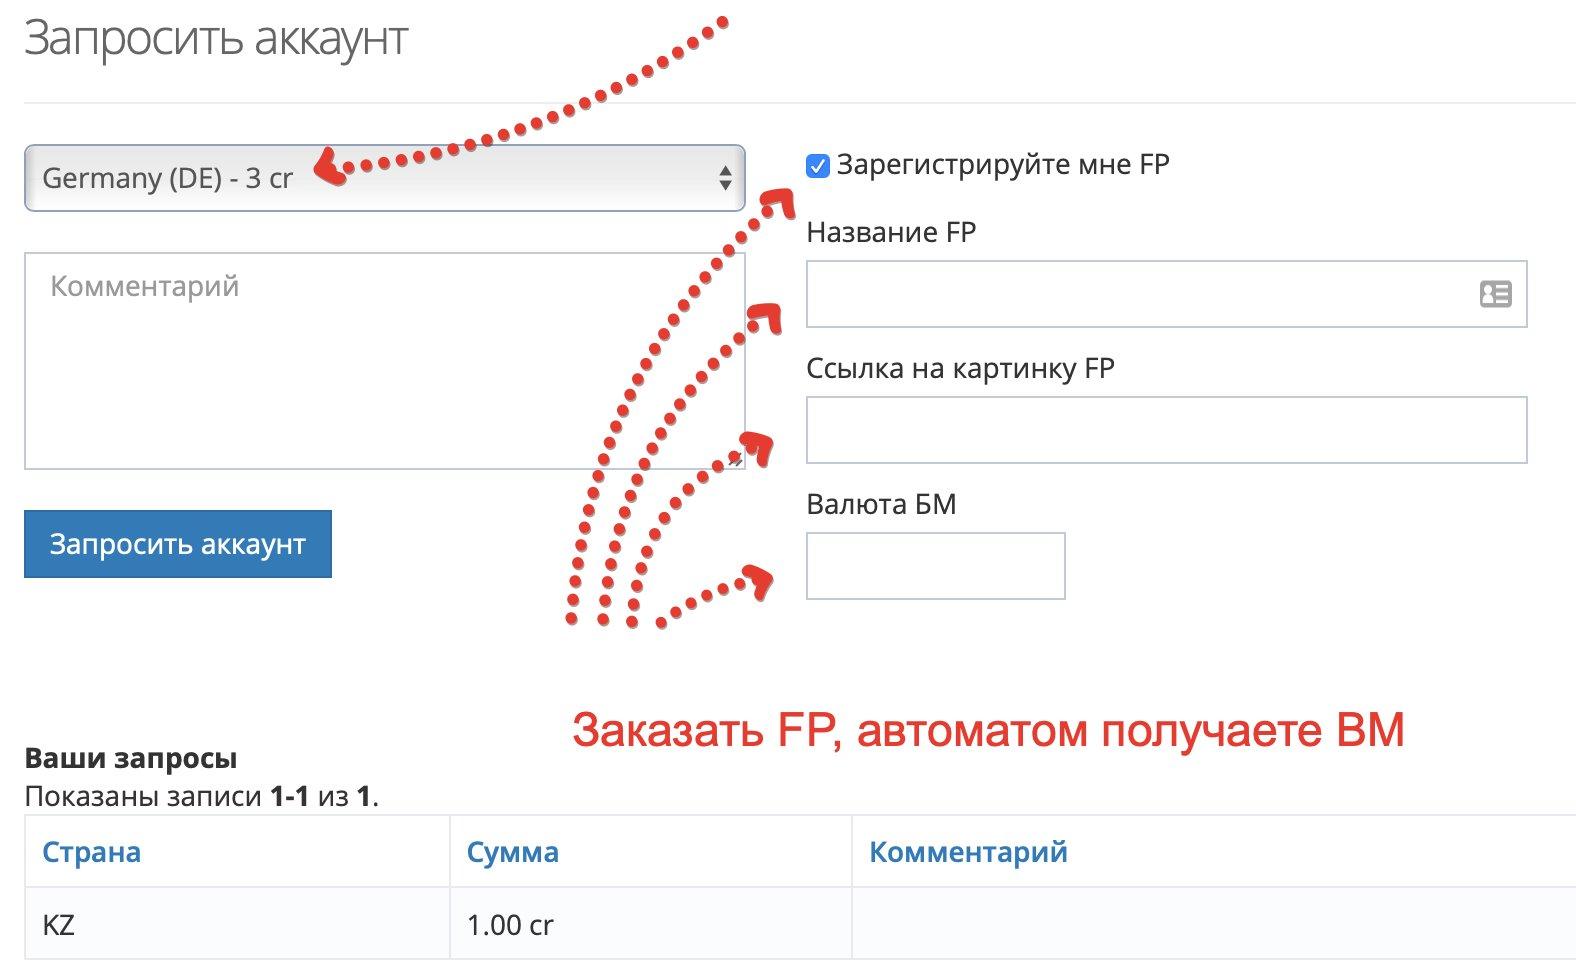 Покупка аккаунта Facebook